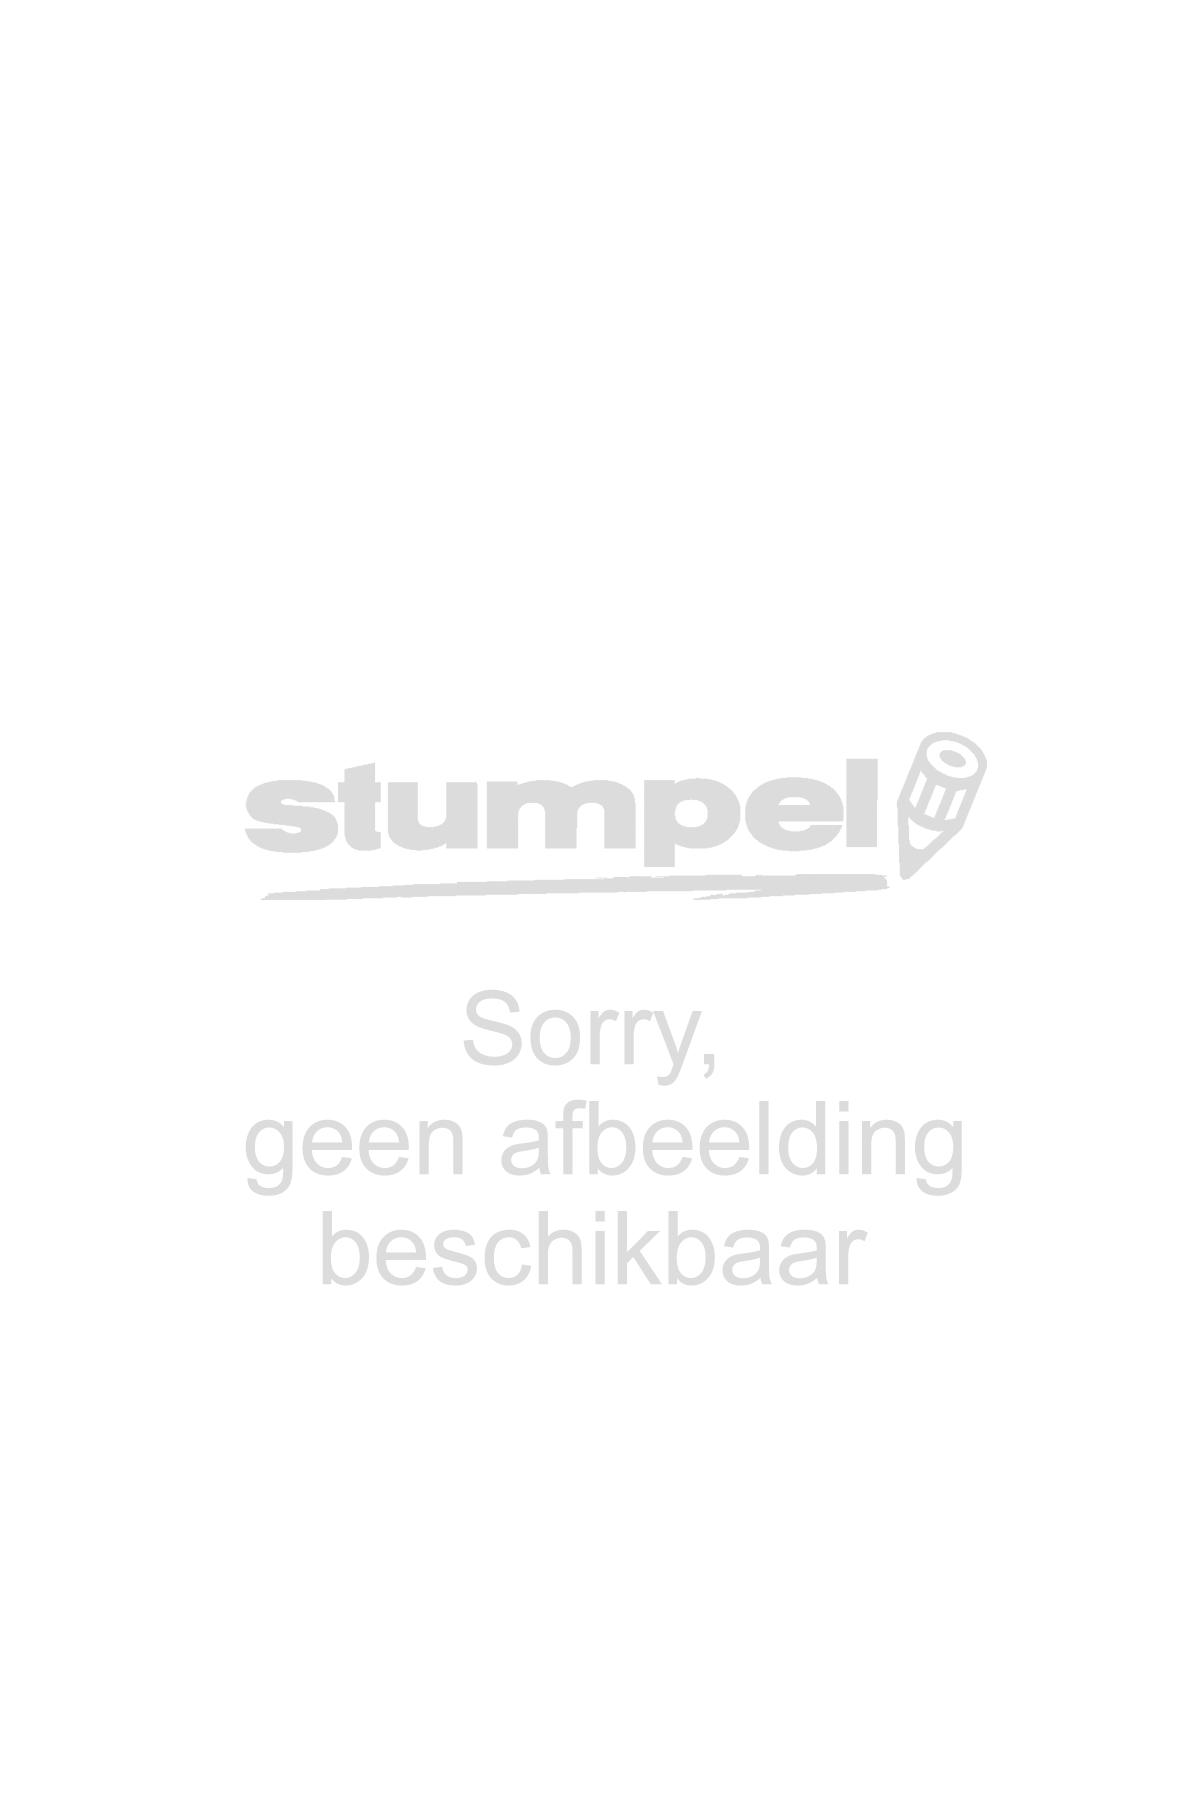 whiteboardstift-pilot-5071-groen-4-0mm-punt-920344